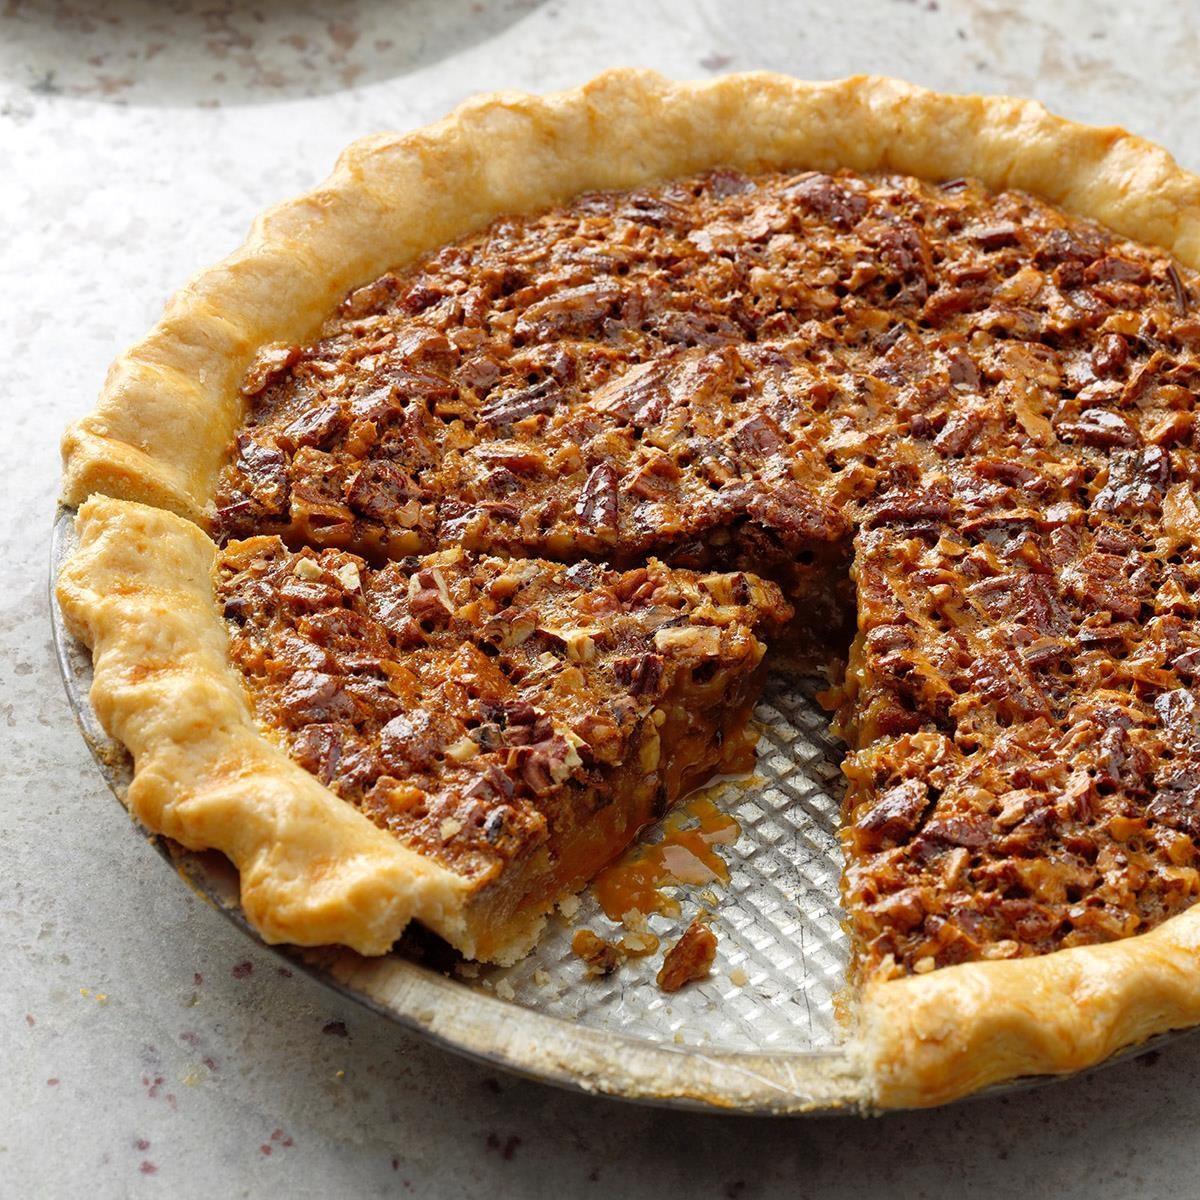 Thanksgiving Desserts Pecan Pie Pumpkin Pie More: Caramel Pecan Pie Recipe